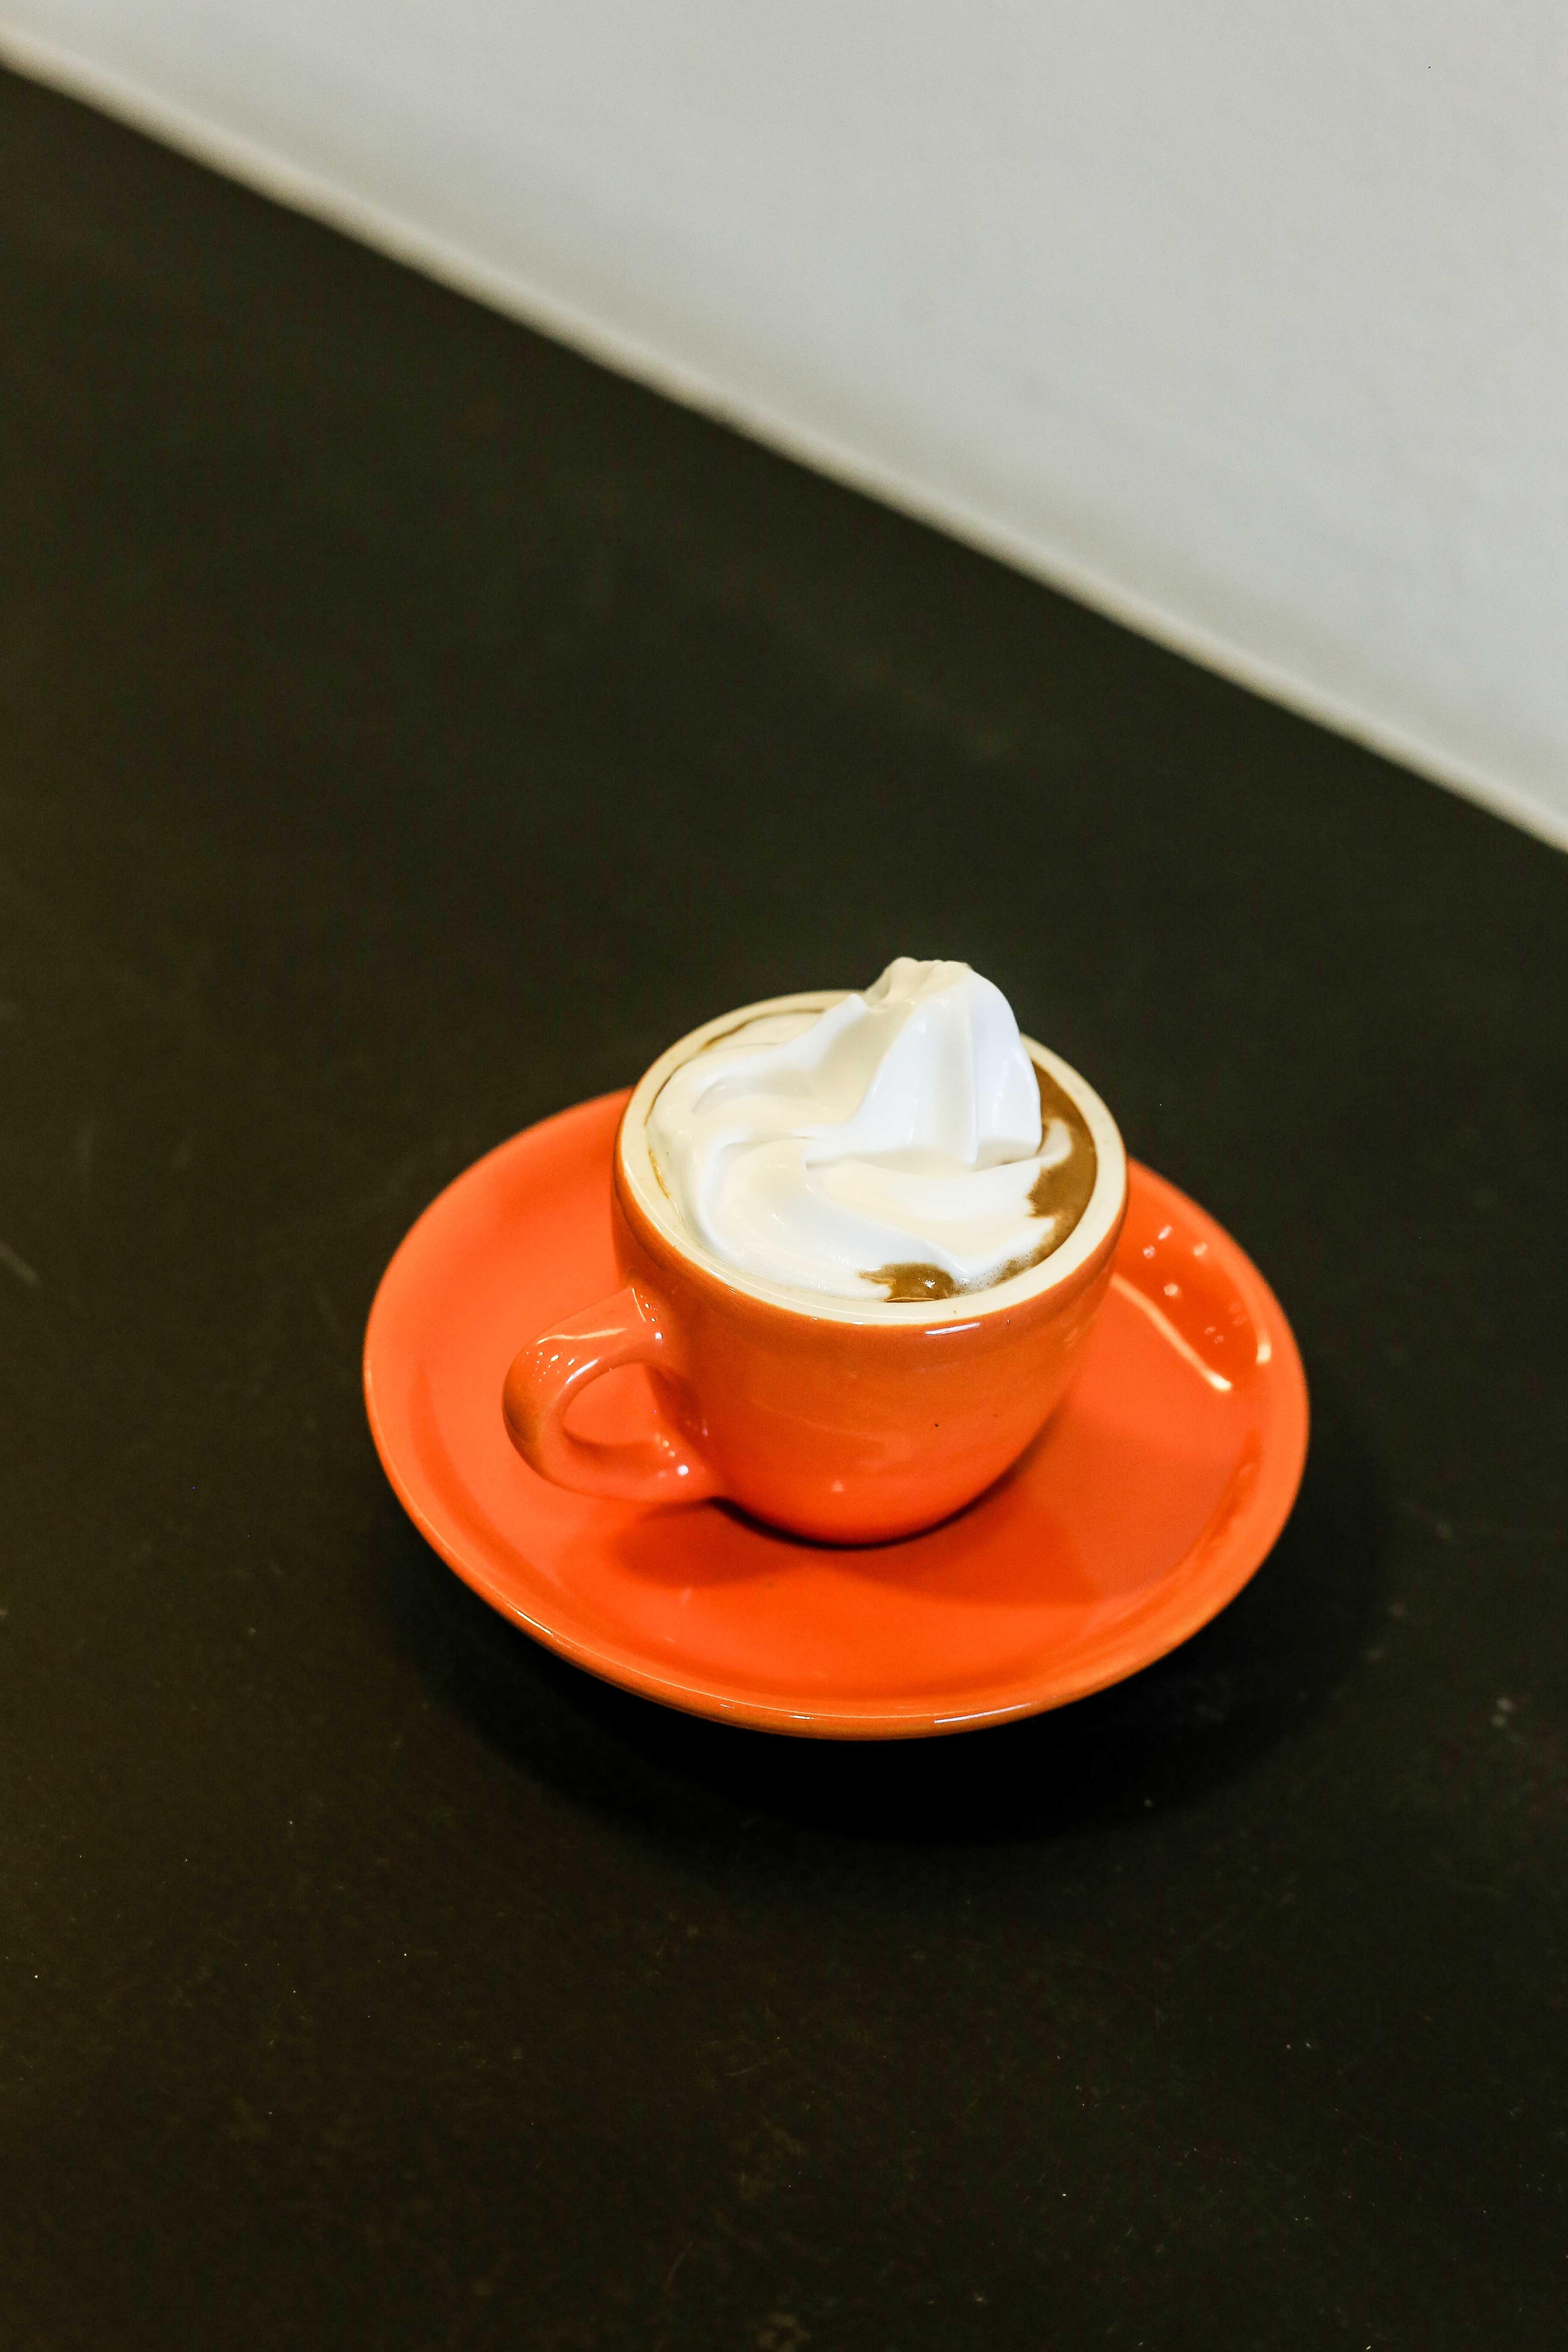 nolisoliph-eats-cafe-libertad-10